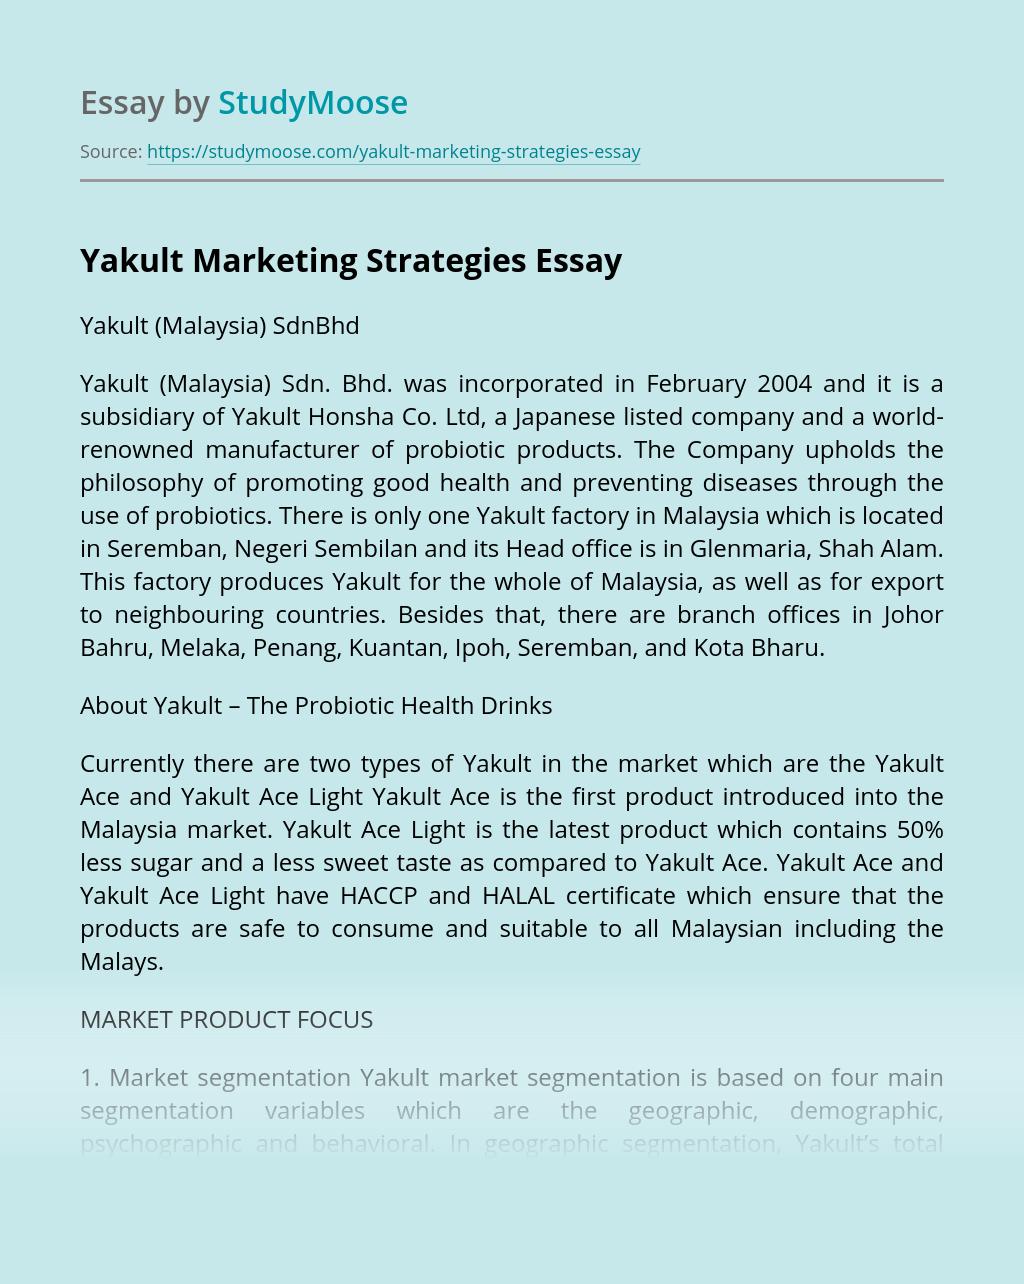 Yakult Marketing Strategies